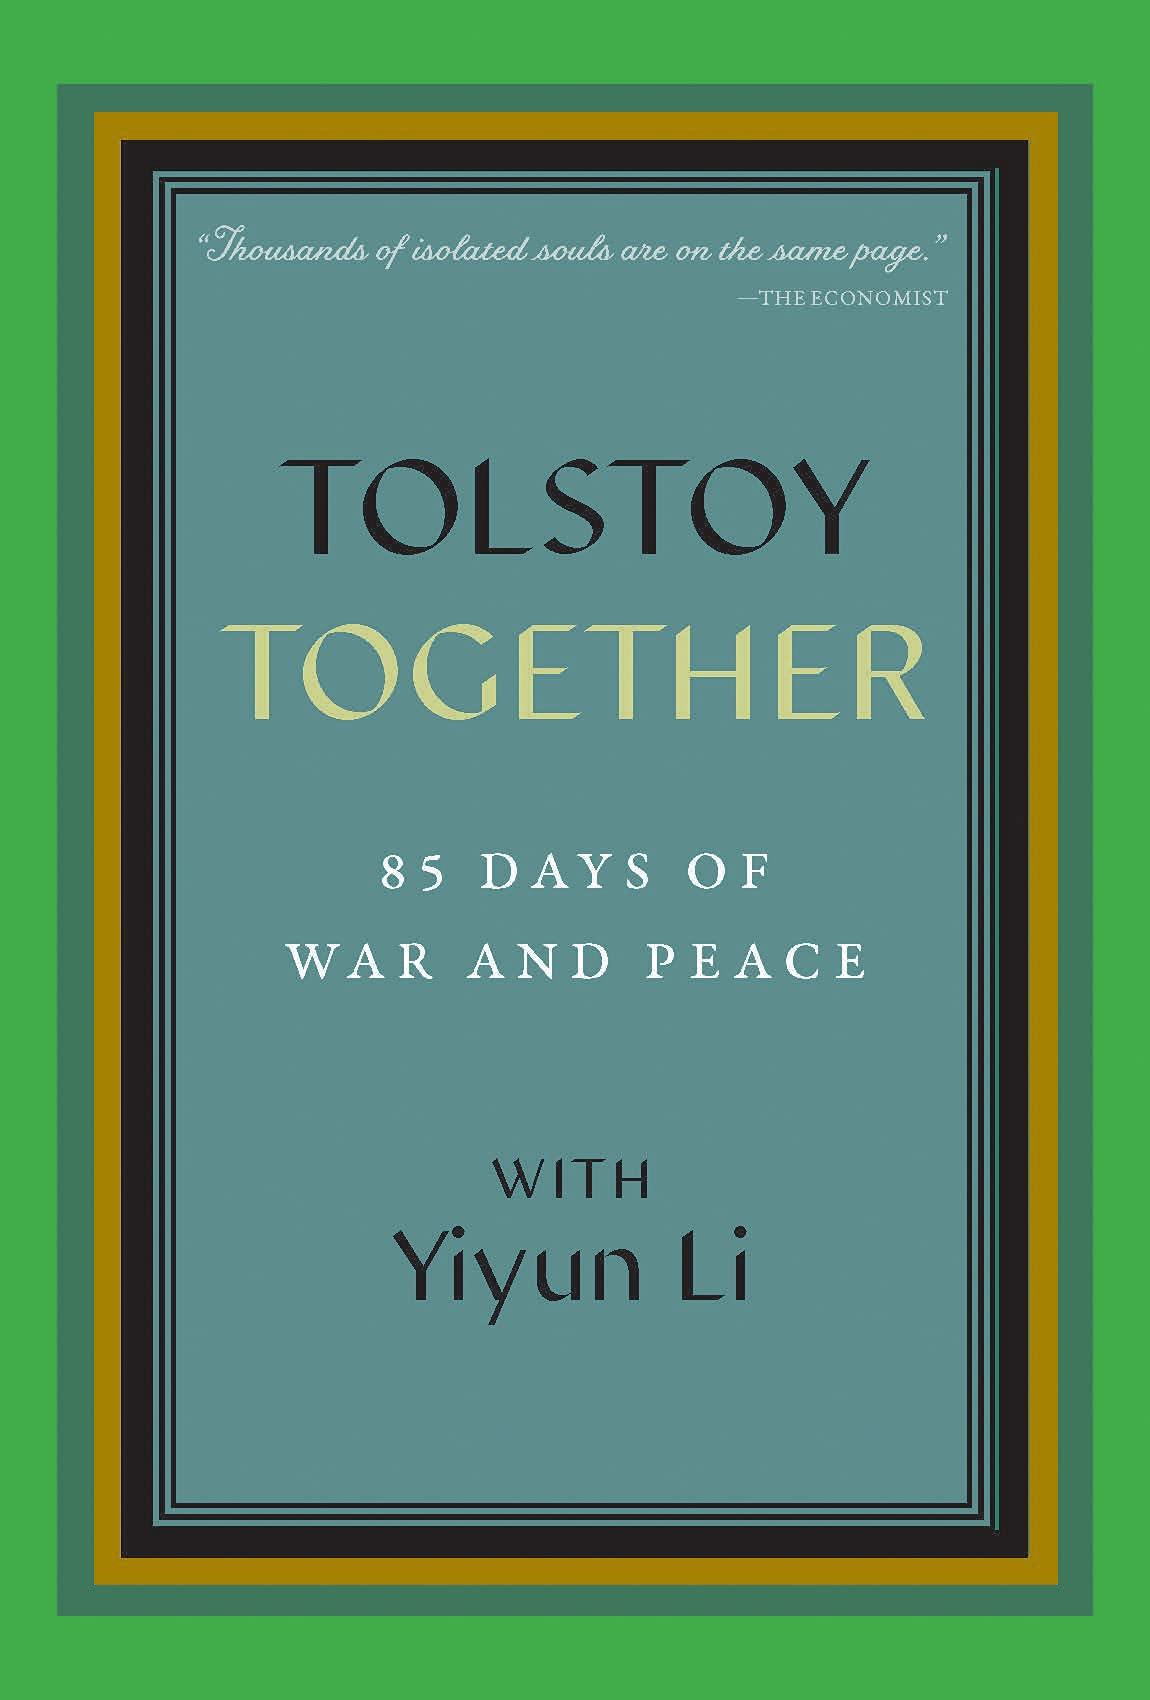 Tolstoy Together: 85 Days of War and Peace with Yiyun Li: Li, Yiyun, A  Public Space: 9781734590760: Amazon.com: Books